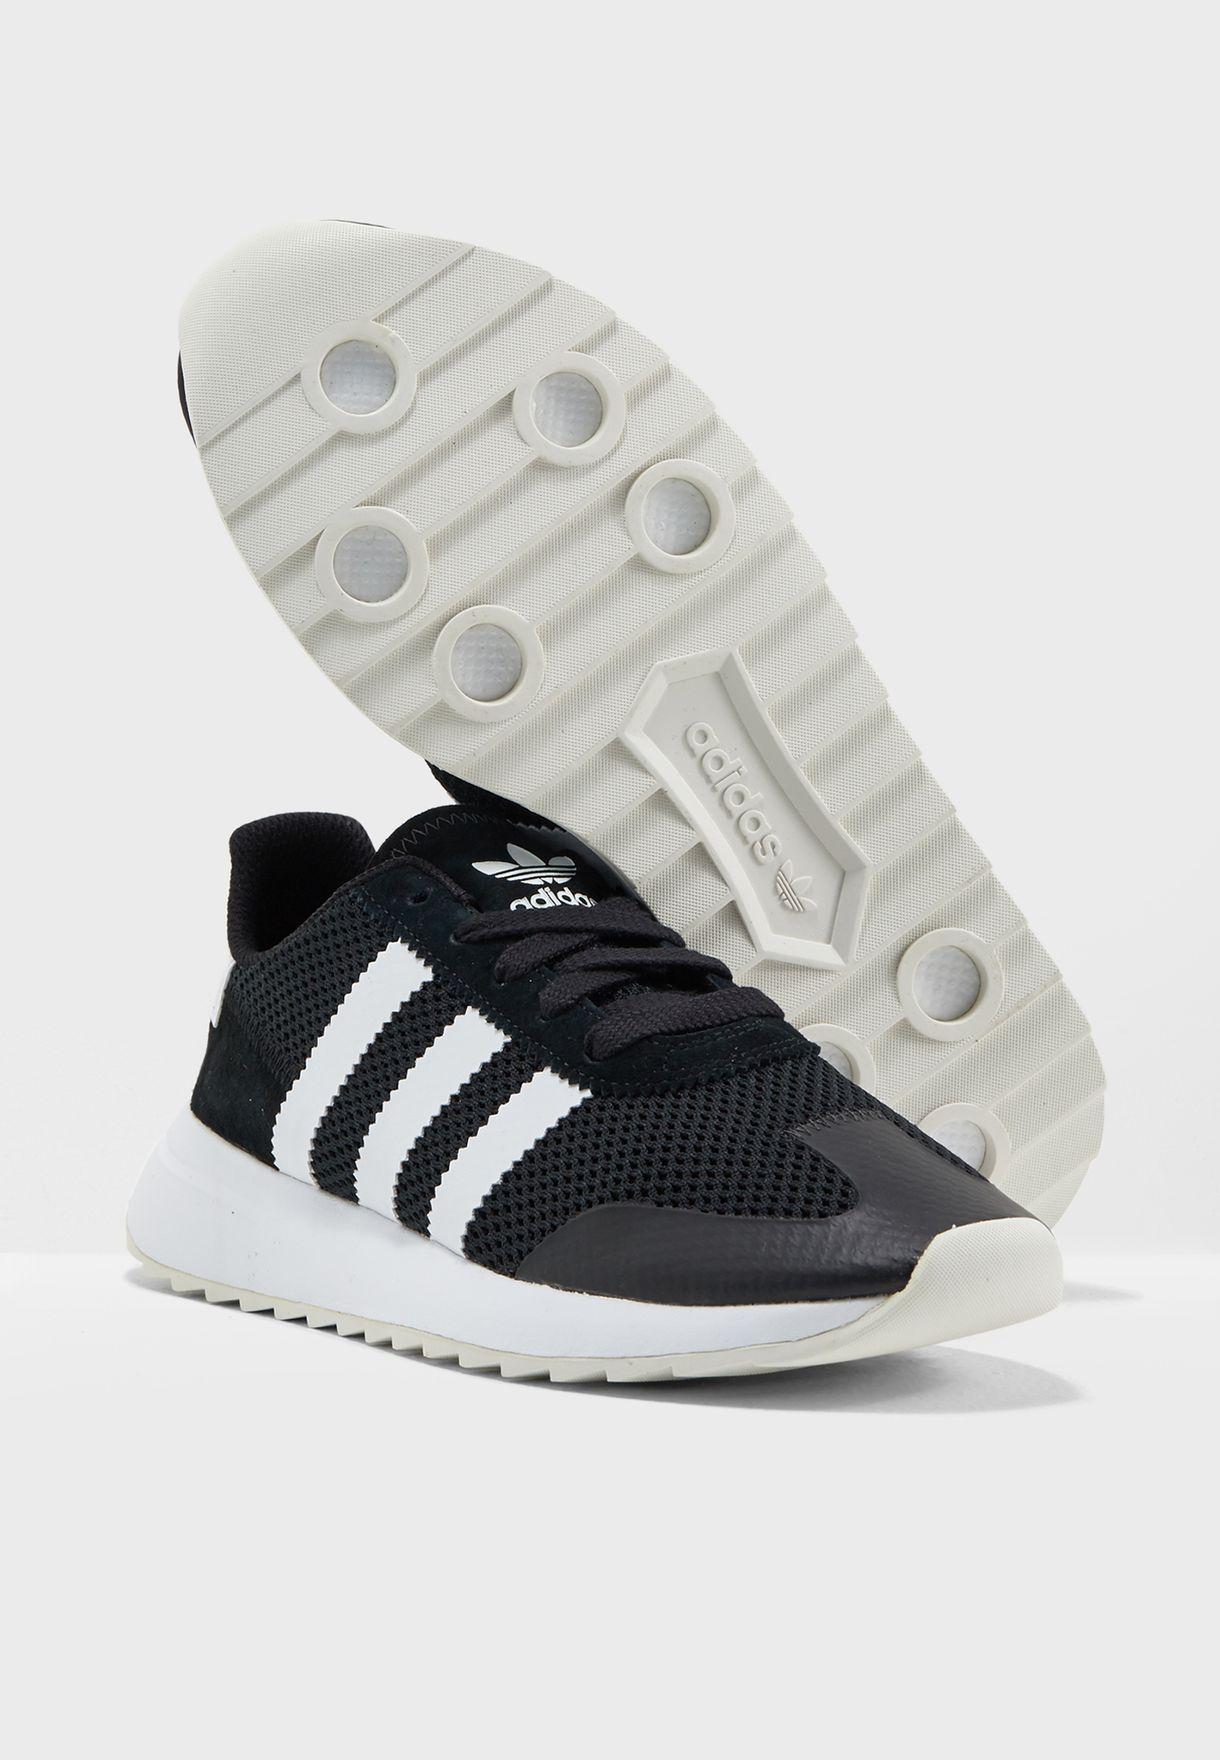 half off 9b0cc 260d9 adidas Originals. Flashback